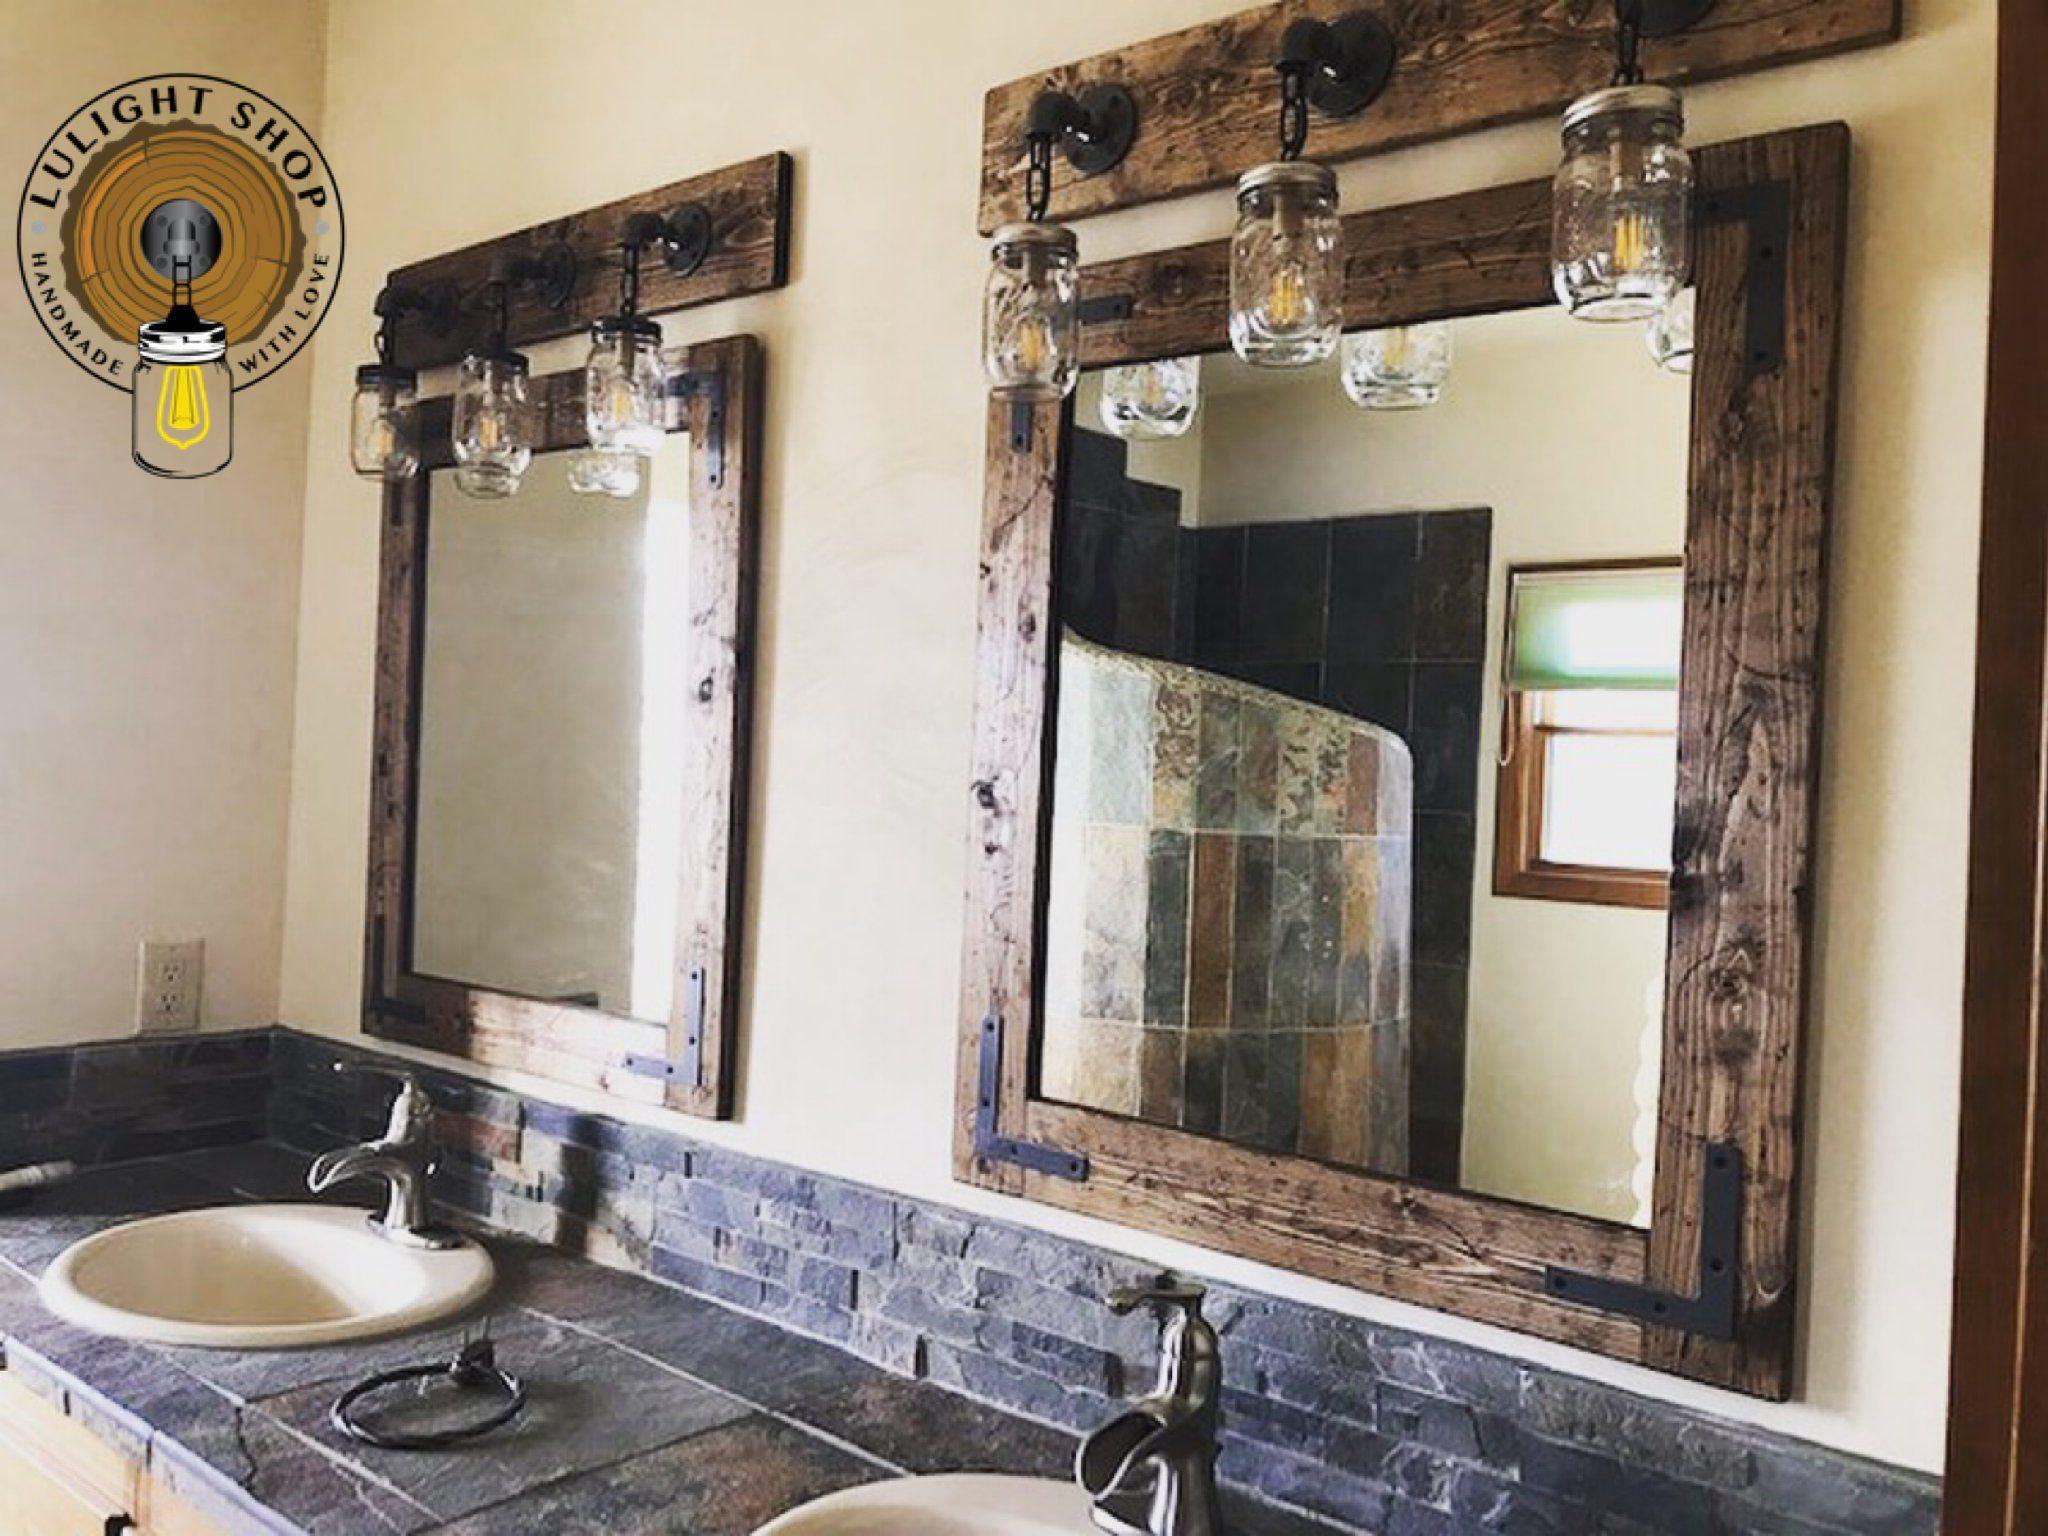 Rustic Distressed Mirror Wall Mirror Bathroom Mirror Rustic Wood Mirror Modern Mirror Vanity Mirror Large Mirror Small Mirror Mirror Farmhouse Mirrors Distressed Mirror Wood Framed Mirror